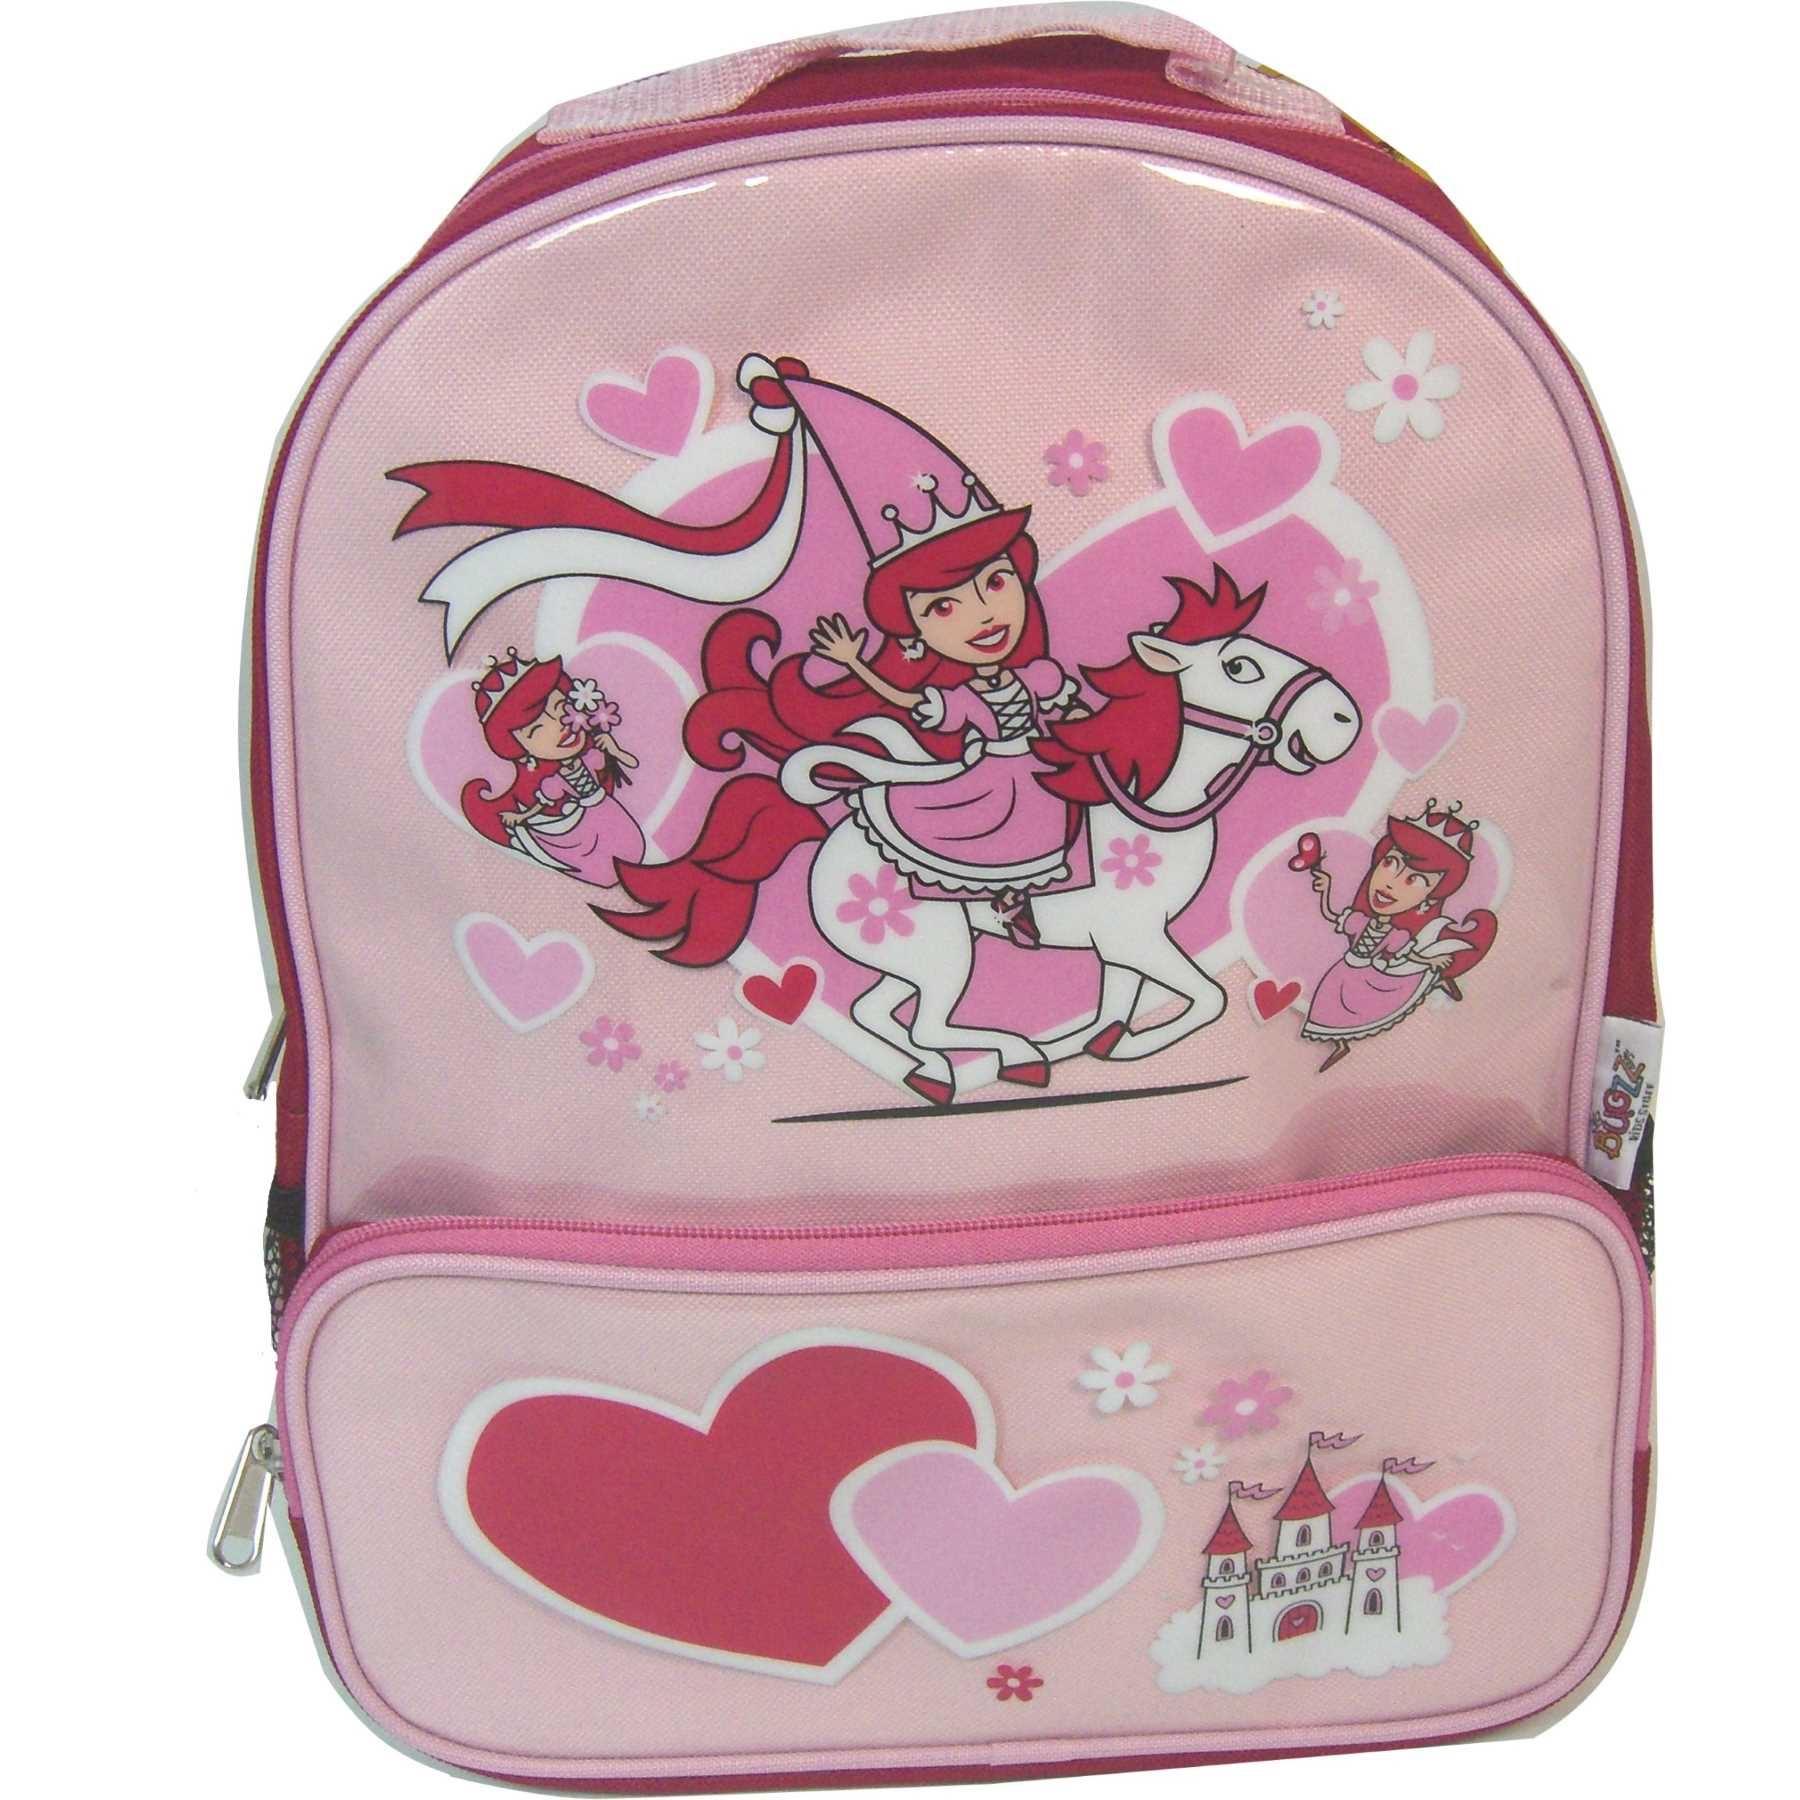 Bugzz PURPLE BUTTERFLY Backpack School Bag Rucksack Girls Swimming Childs Kids